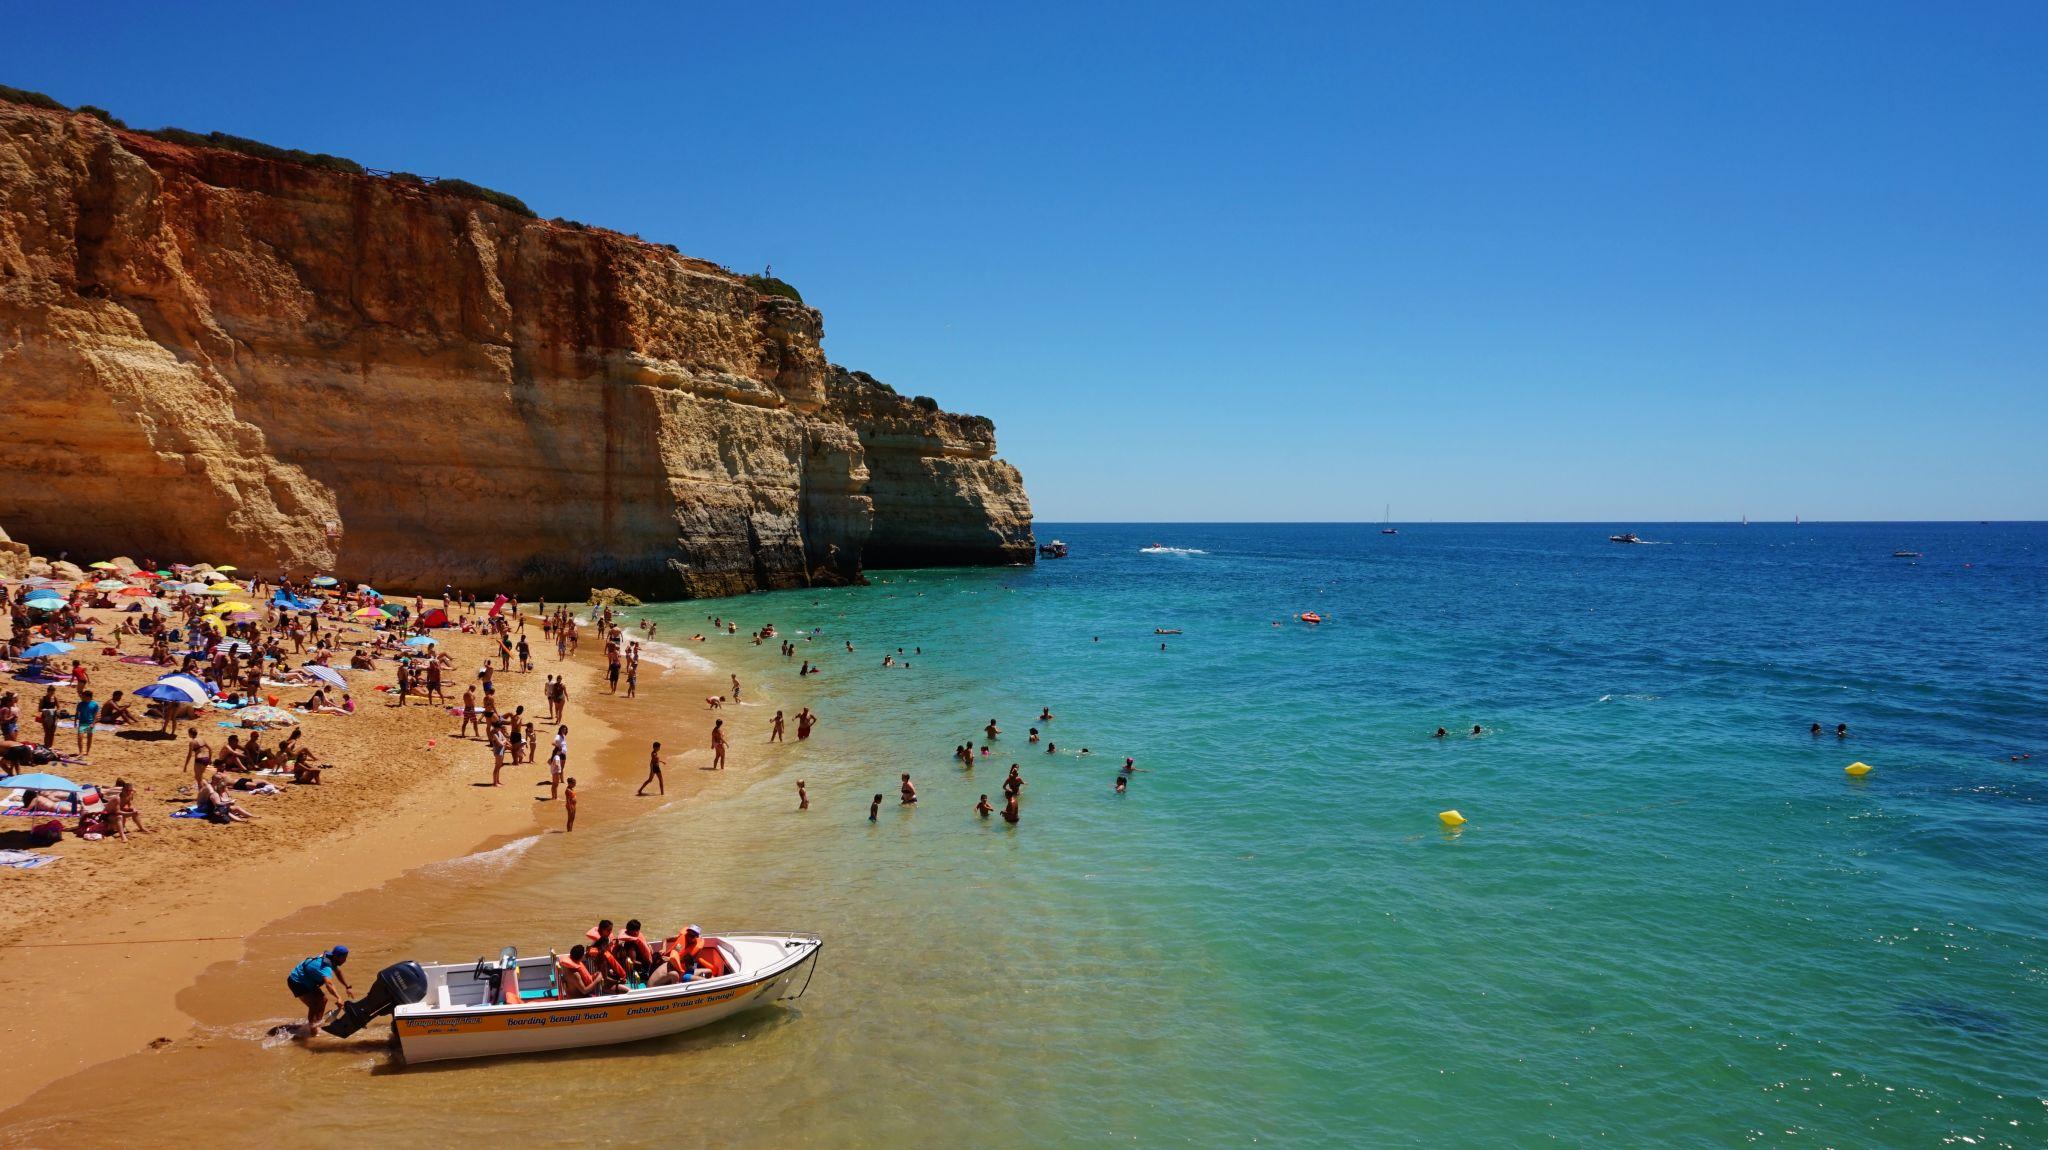 Benagil Beach, Portugal